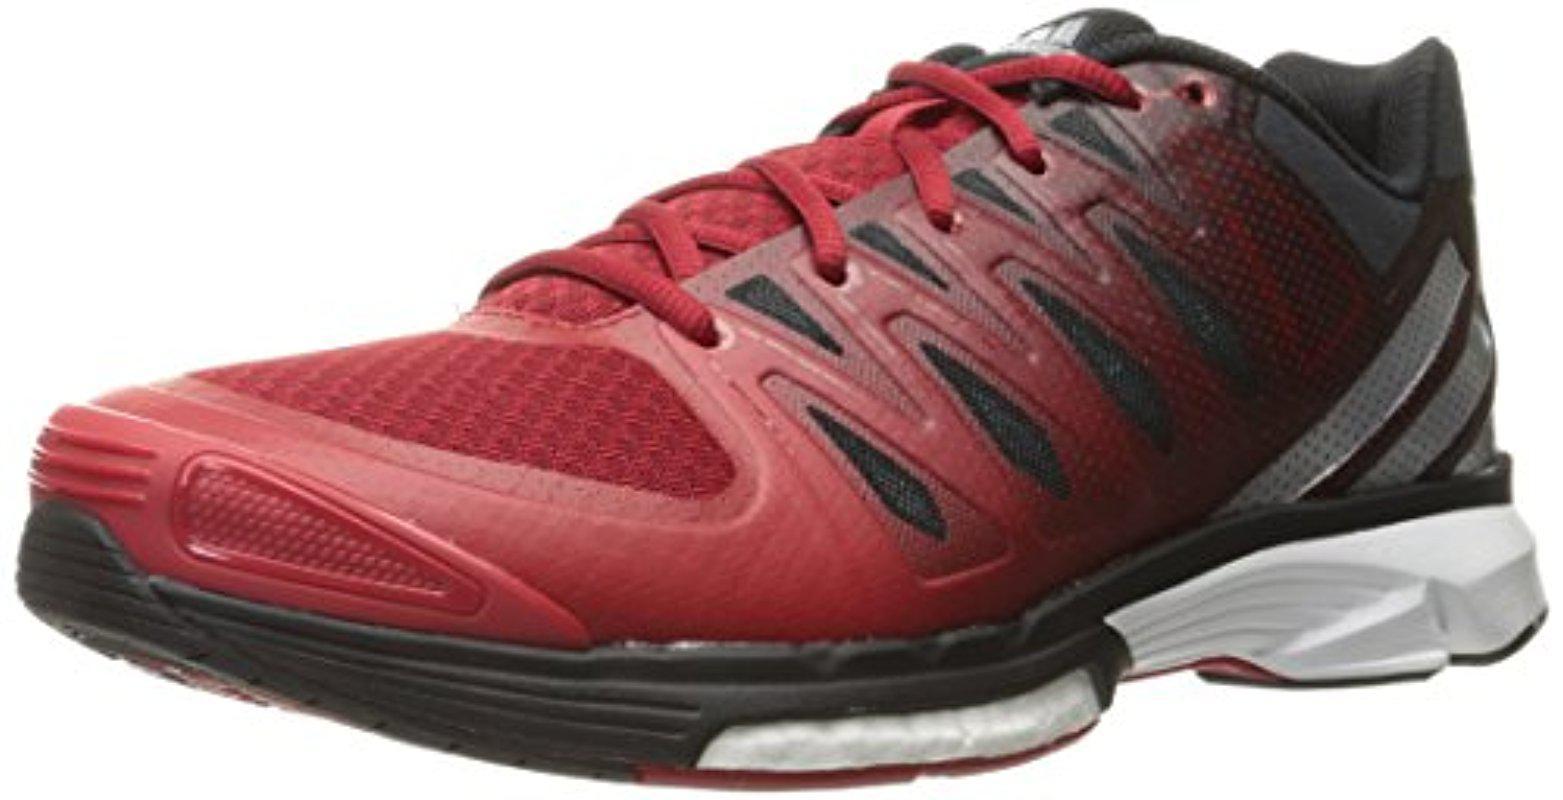 Adidas Neo Oldrunning Schuh Neo Schuh Adidas Oldrunning m8v0wOyNn